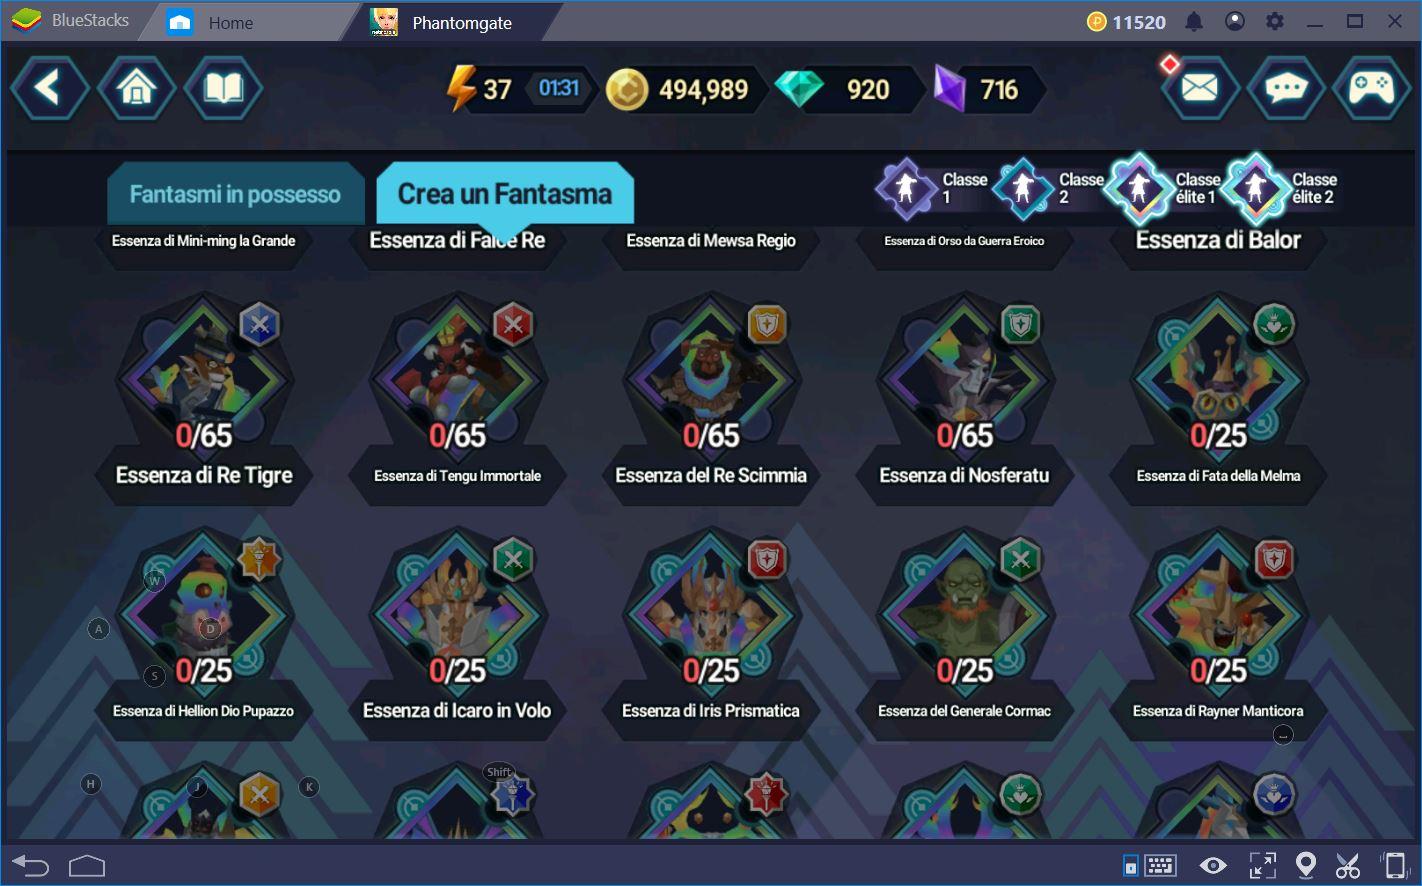 Phantomgate: Come Ottenere Fantasmi ed Eroi